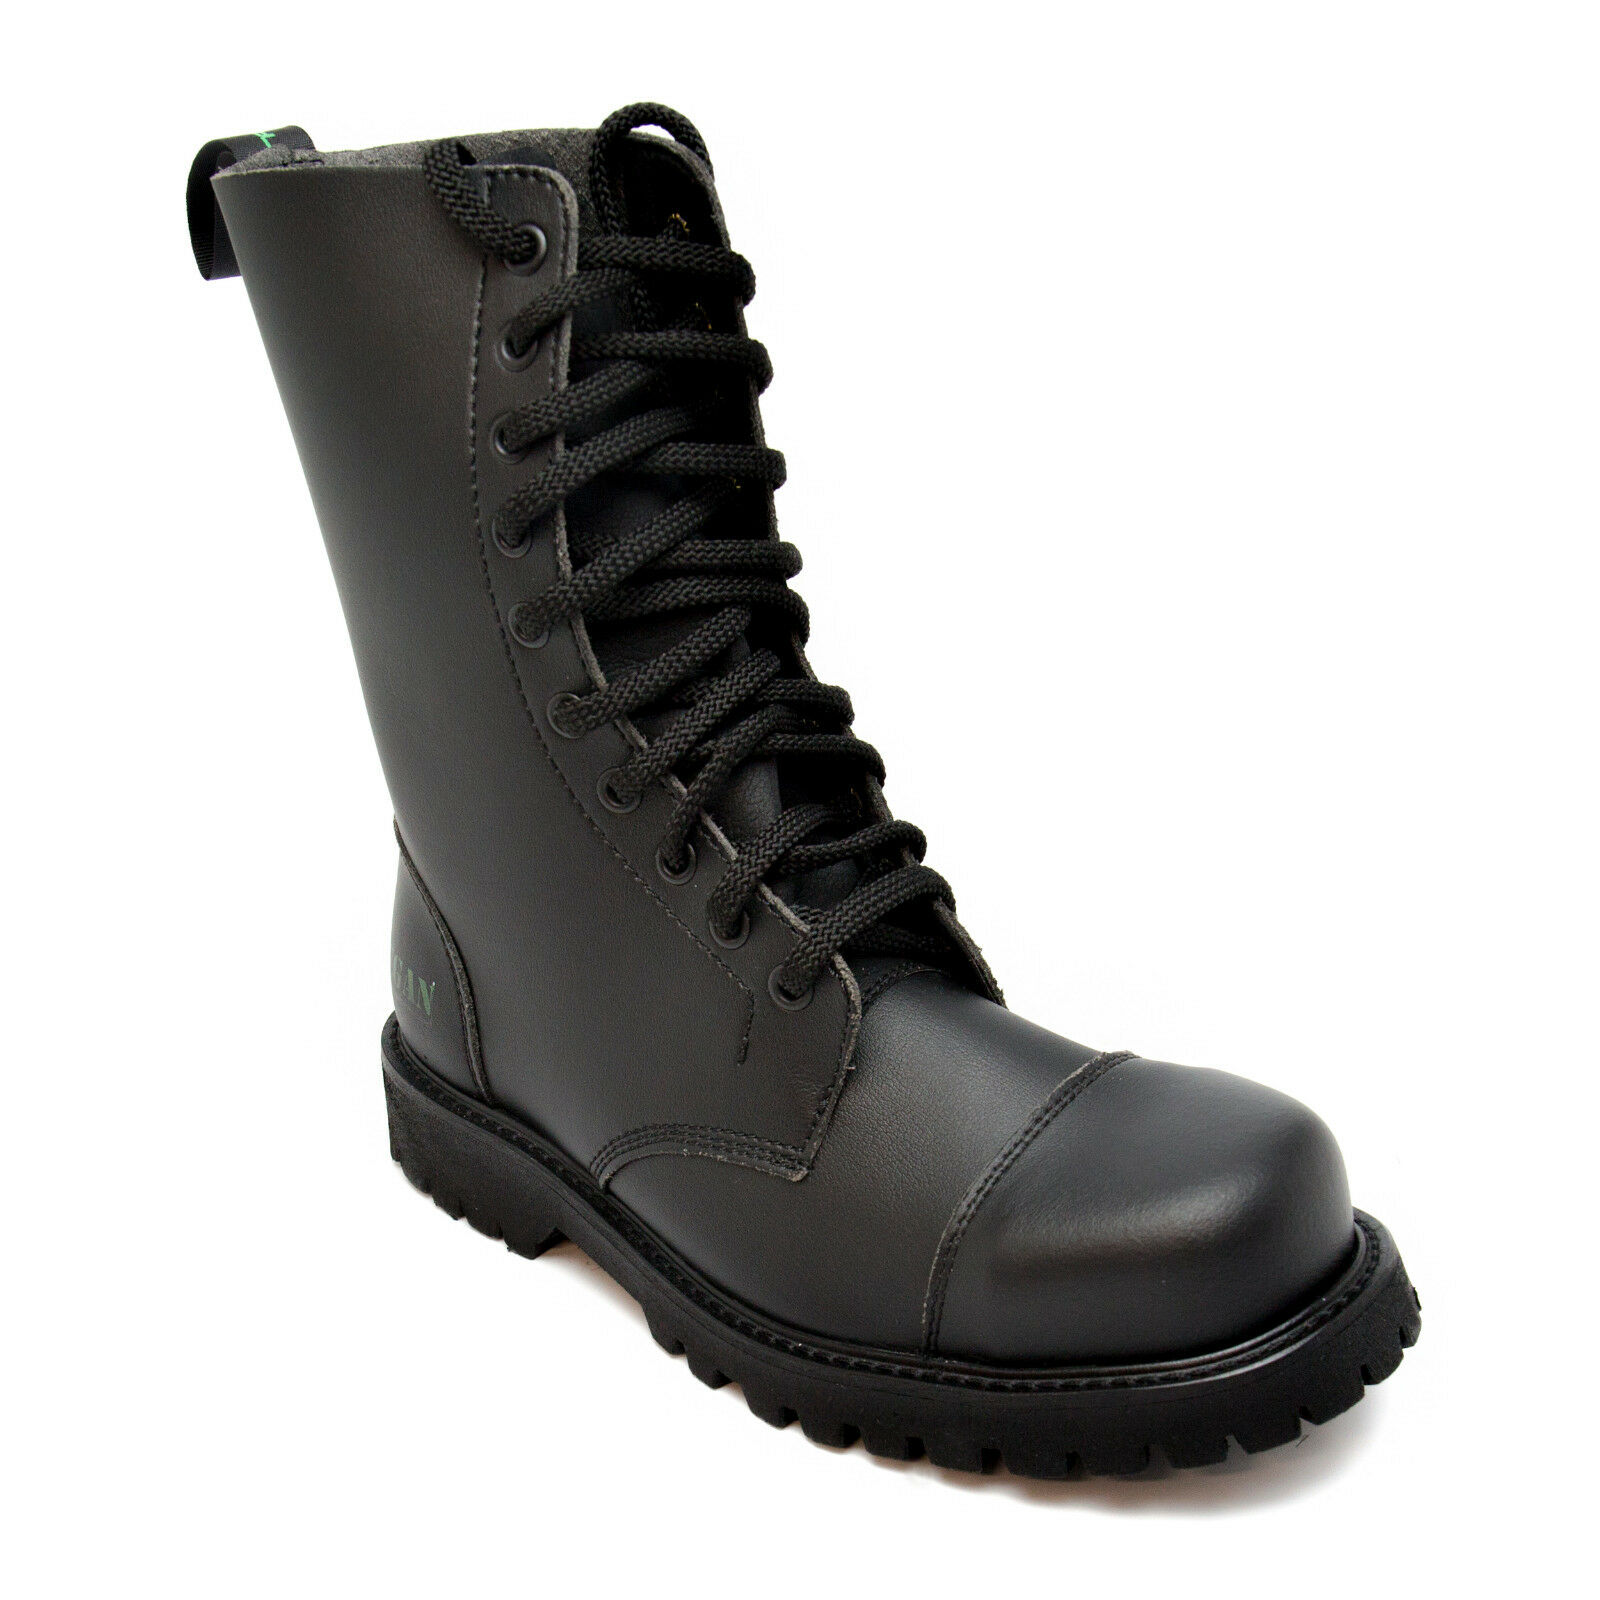 Acero Vegano Puntera Trabajo Combat bota militar negro durable resistente transpirable